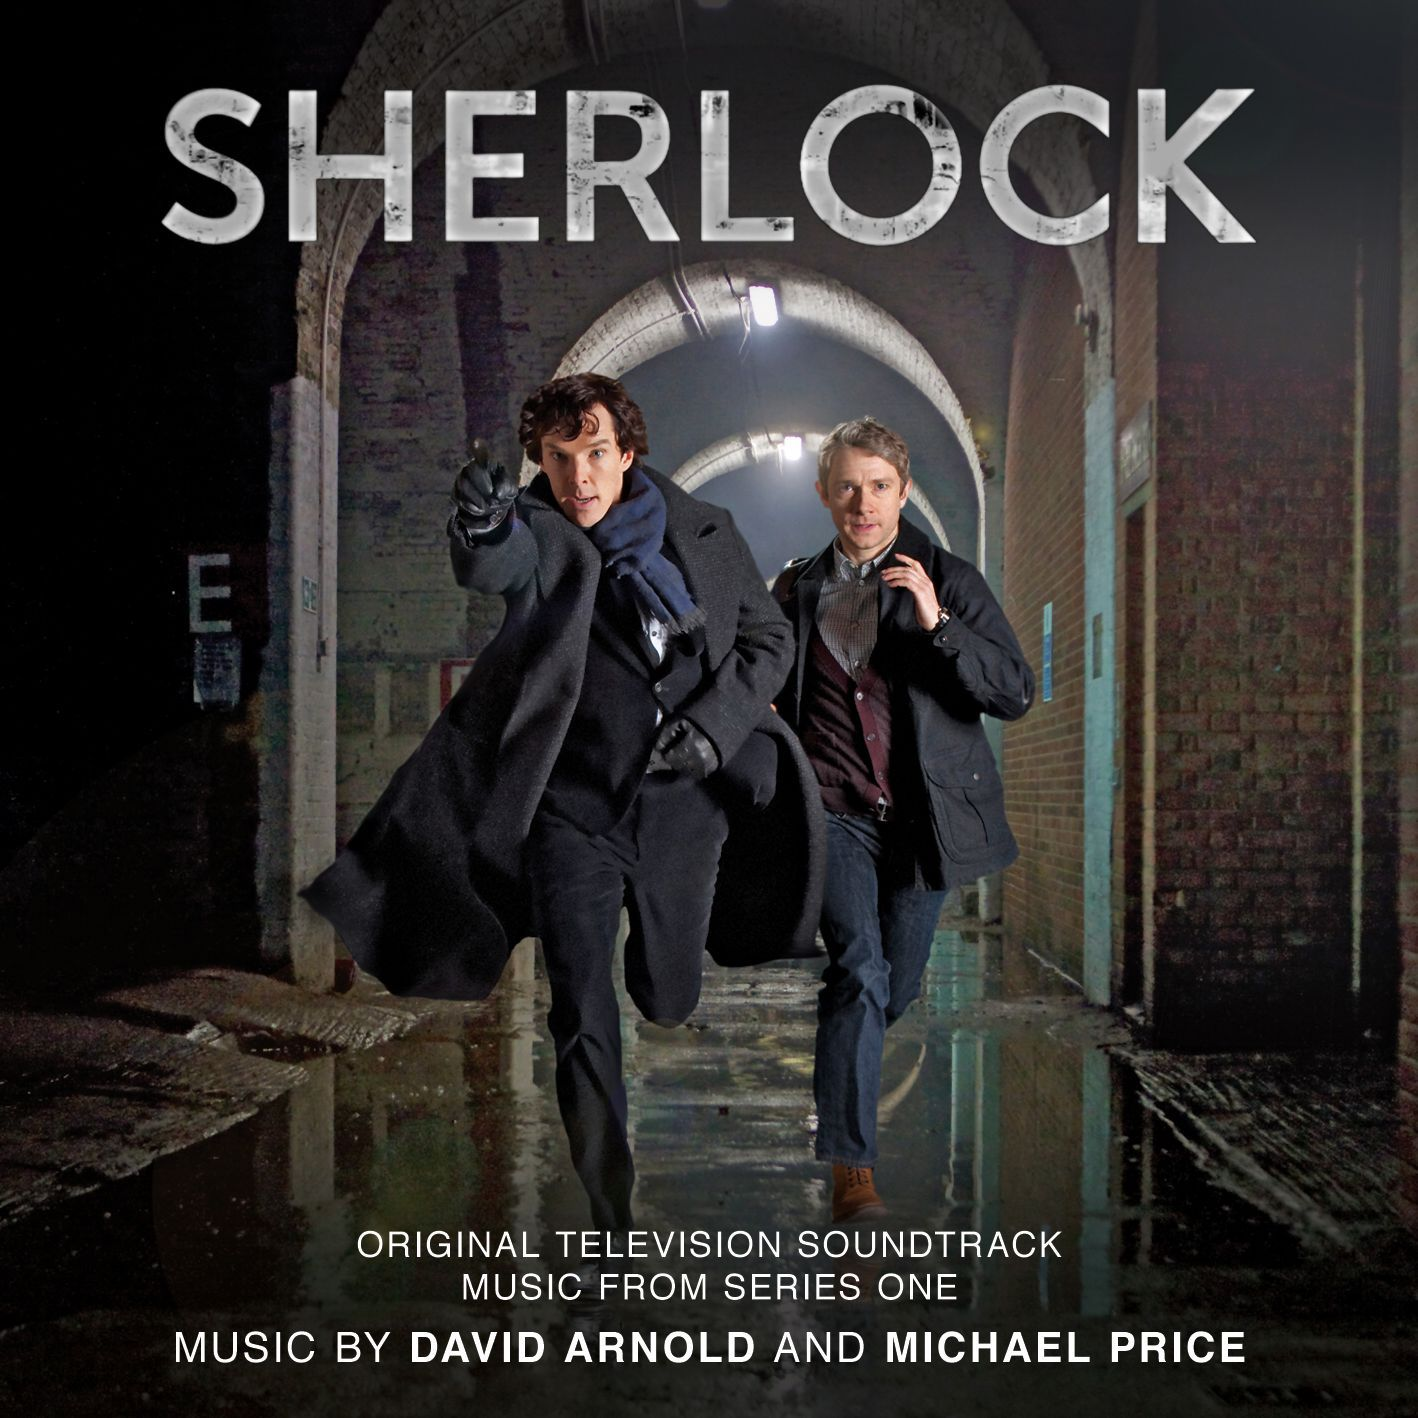 Sherlock Bbc S1 Ost David Arnold Michael Price Mp3 320 Kbps